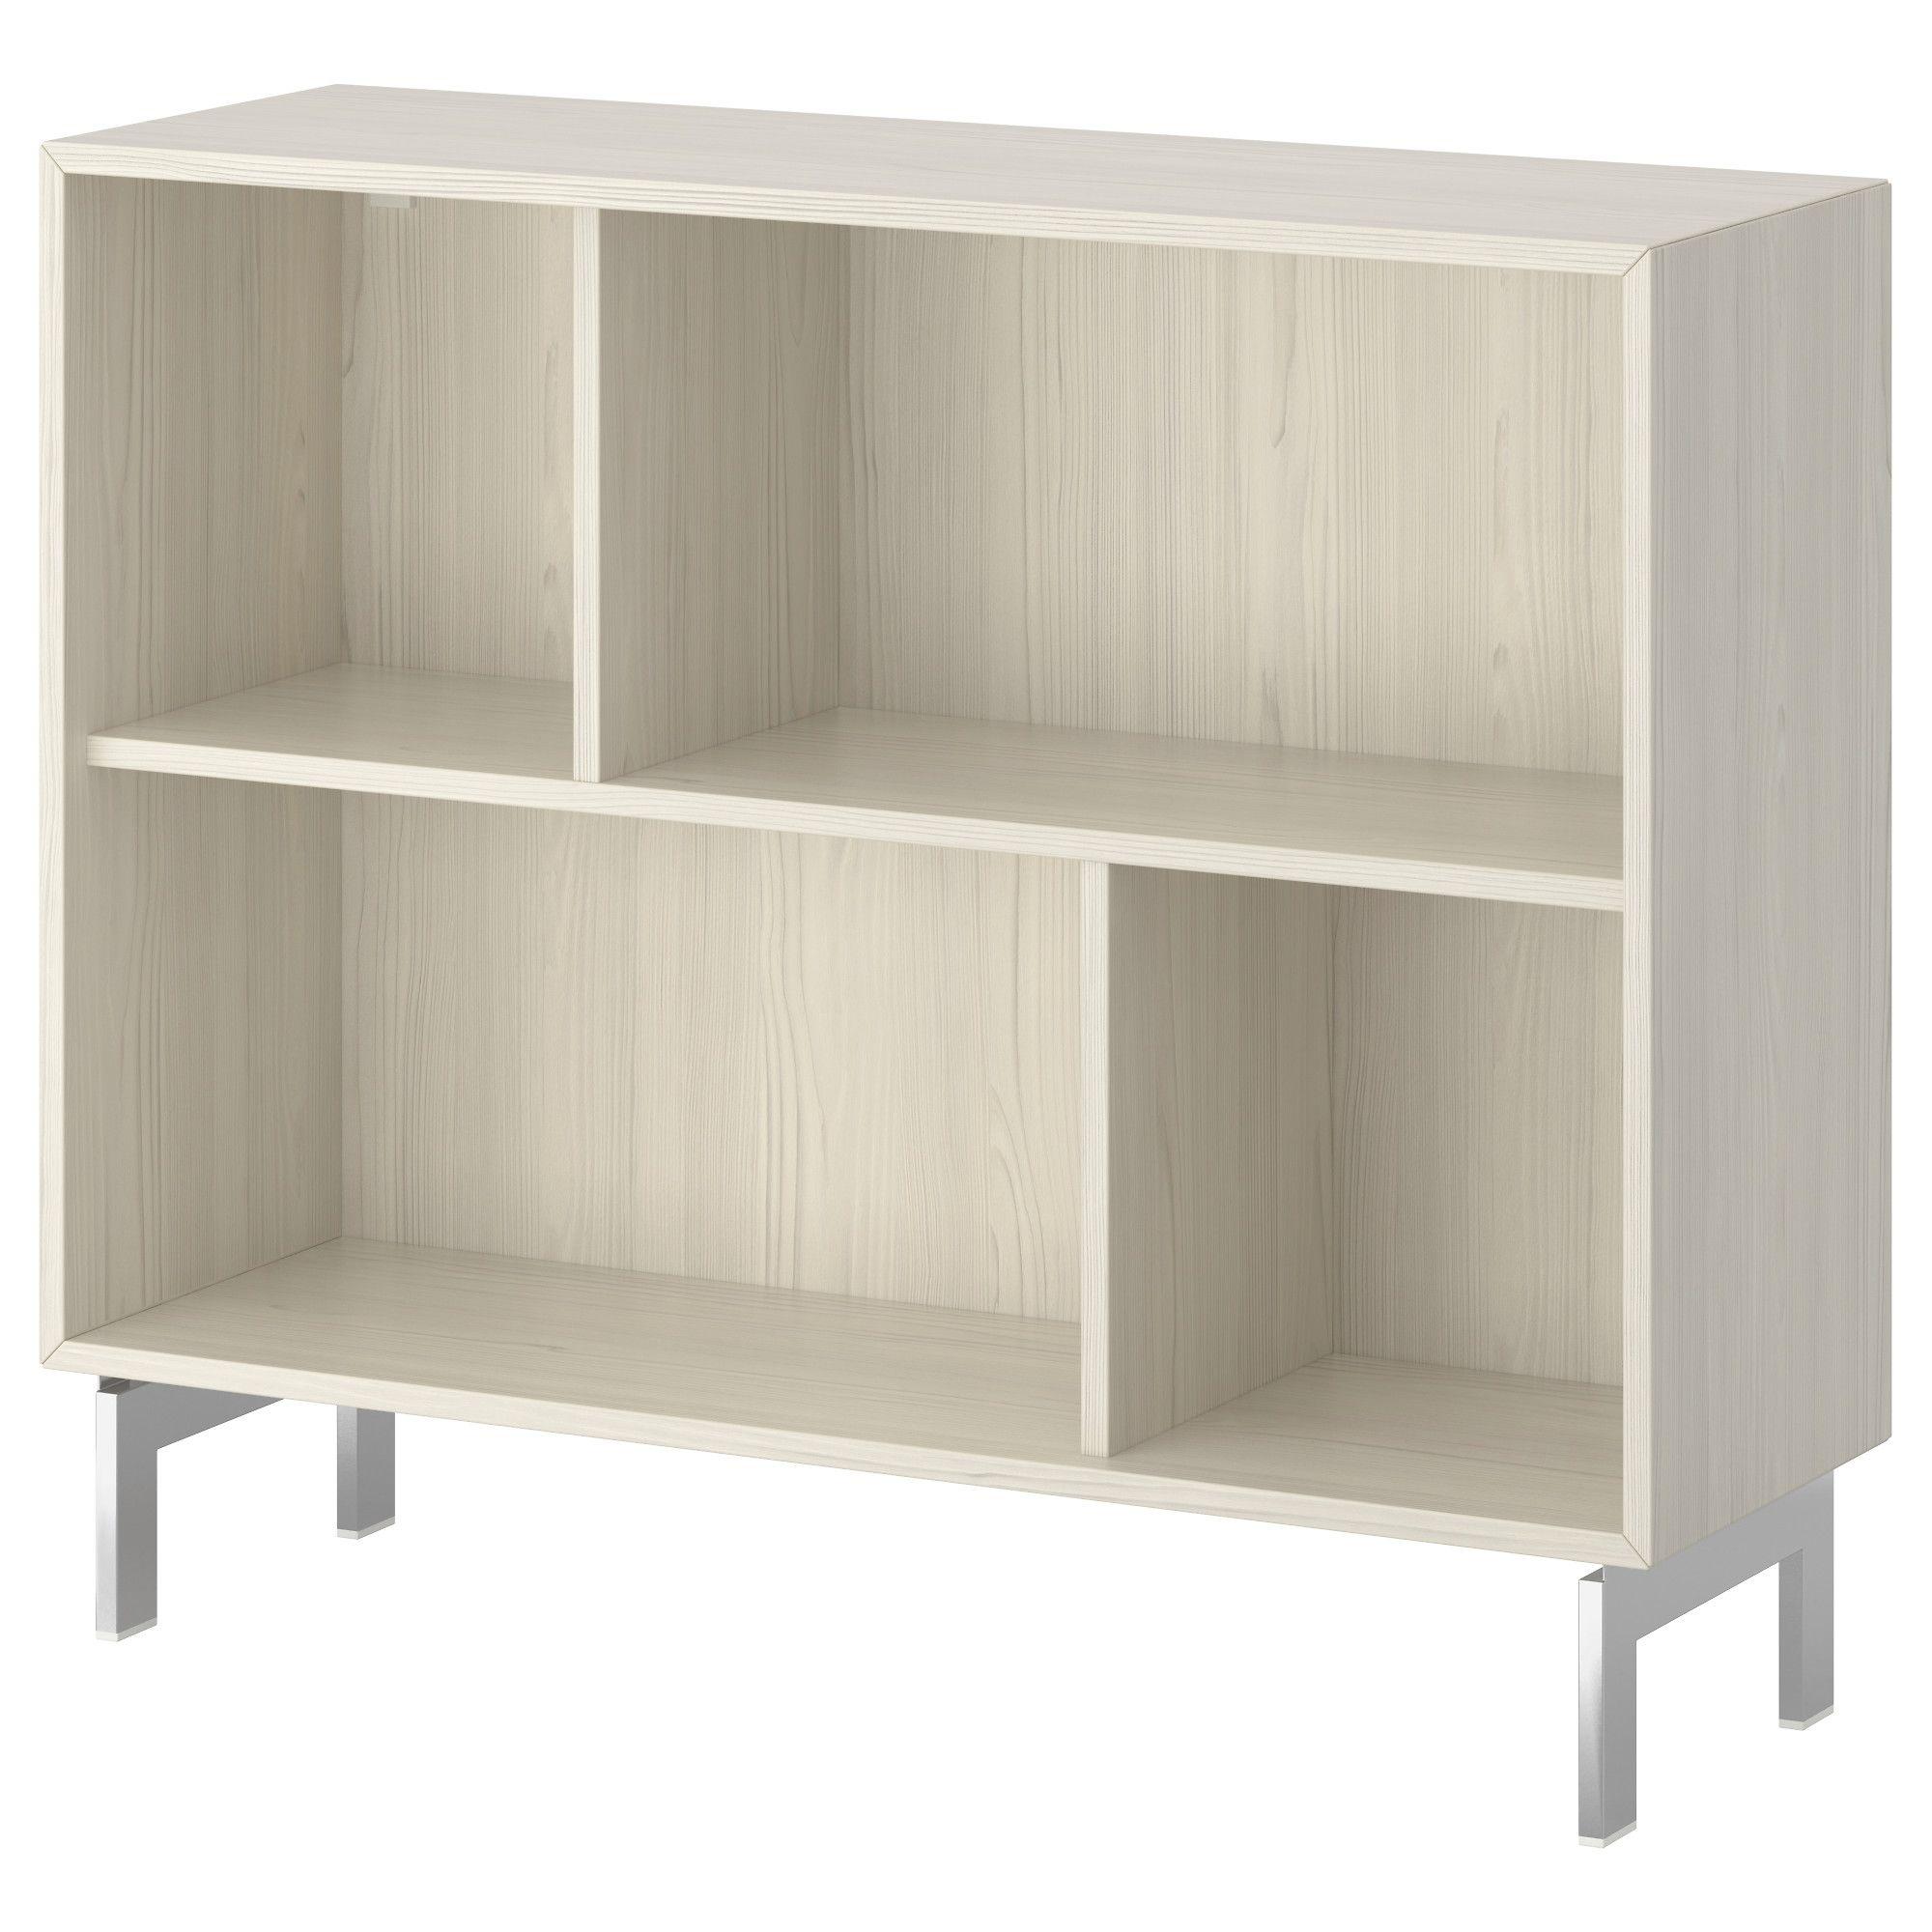 Ikea Valje Shelf Unit Larch White An Asymmetrical Storage  # Ikea Etegere Cube Modulo Bois